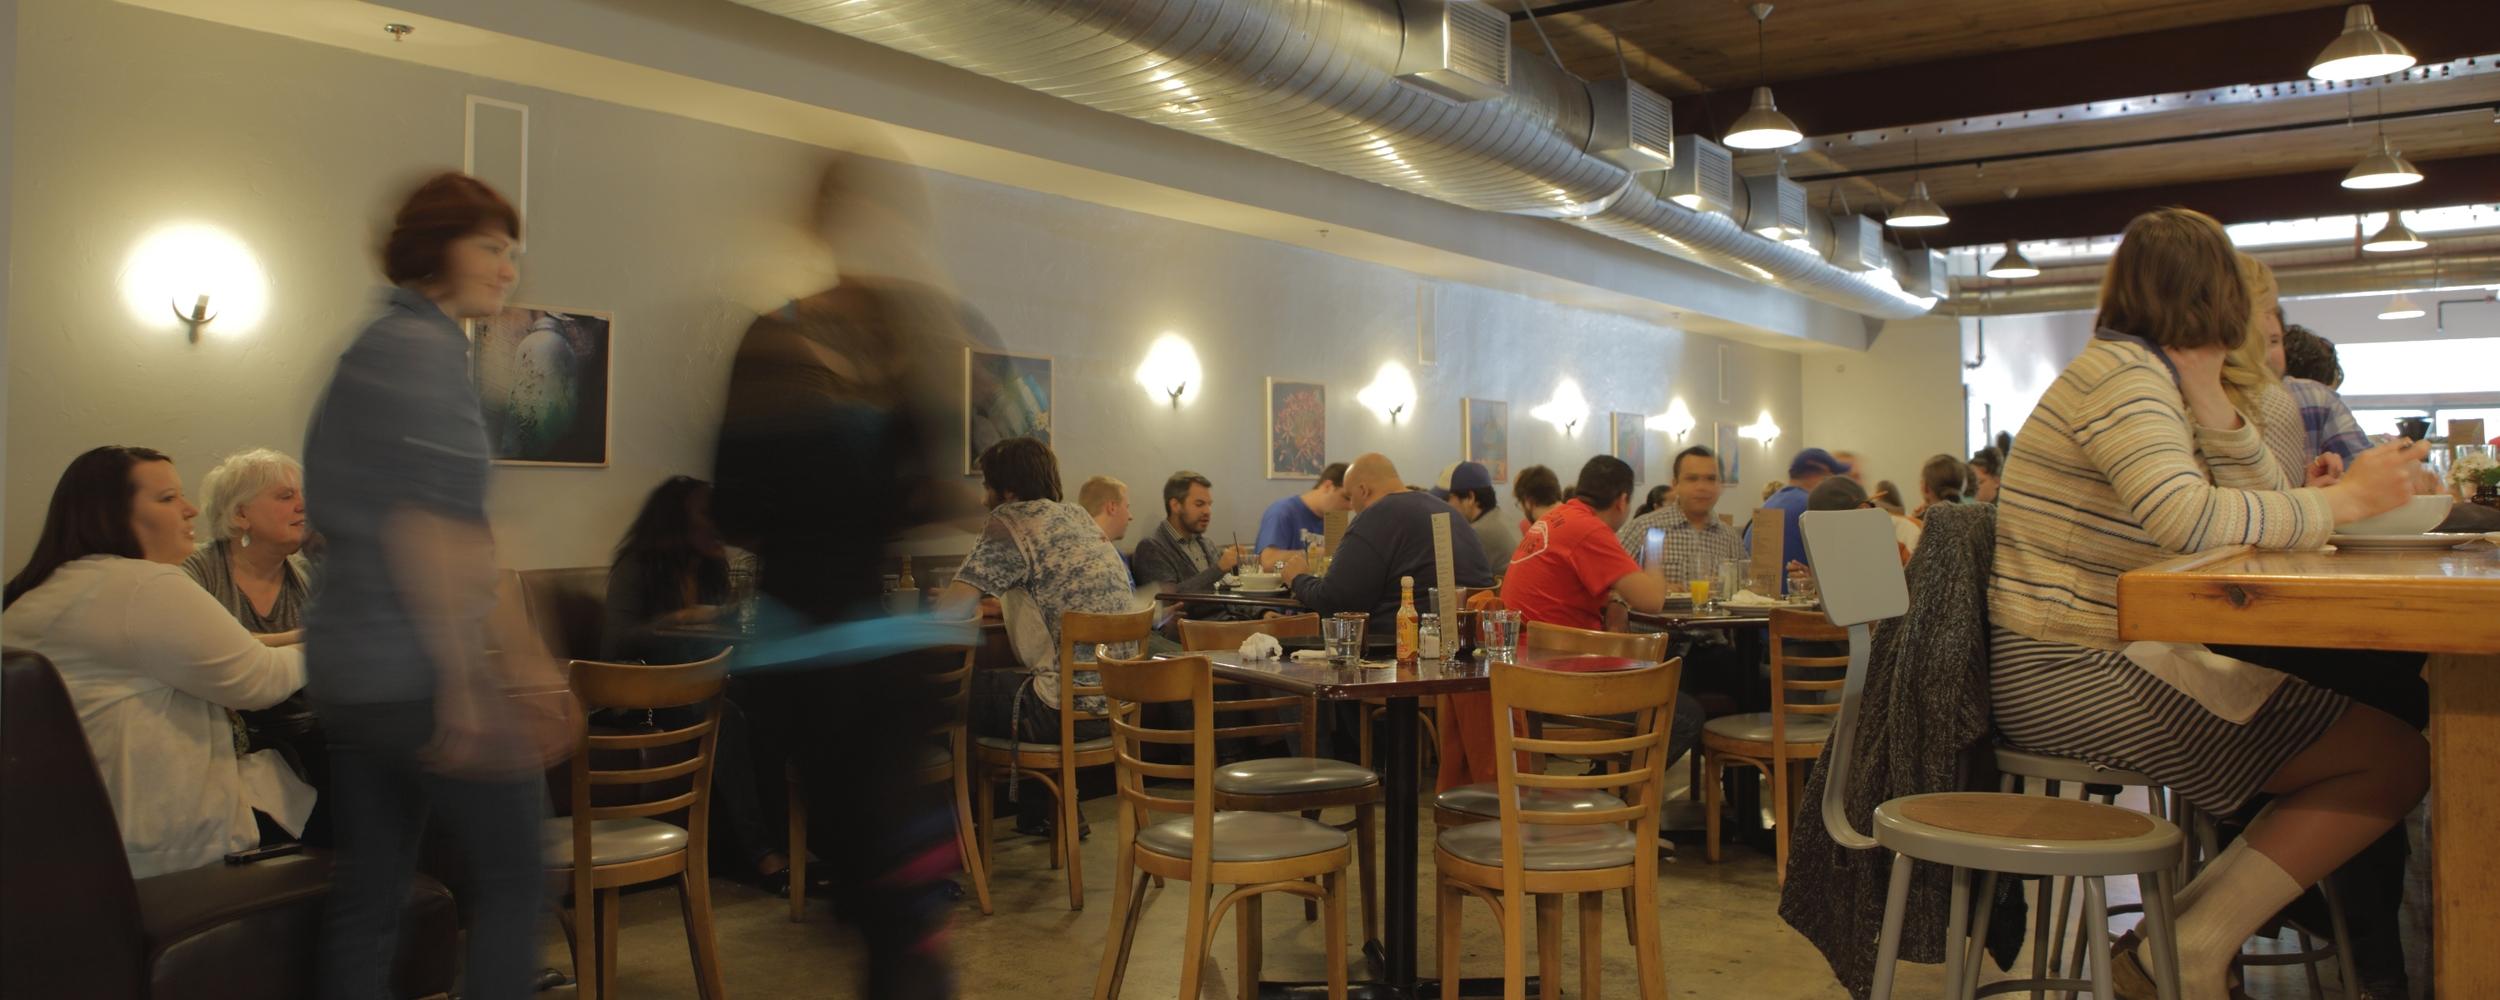 People at restaurant. Photo: Jane Kortright.